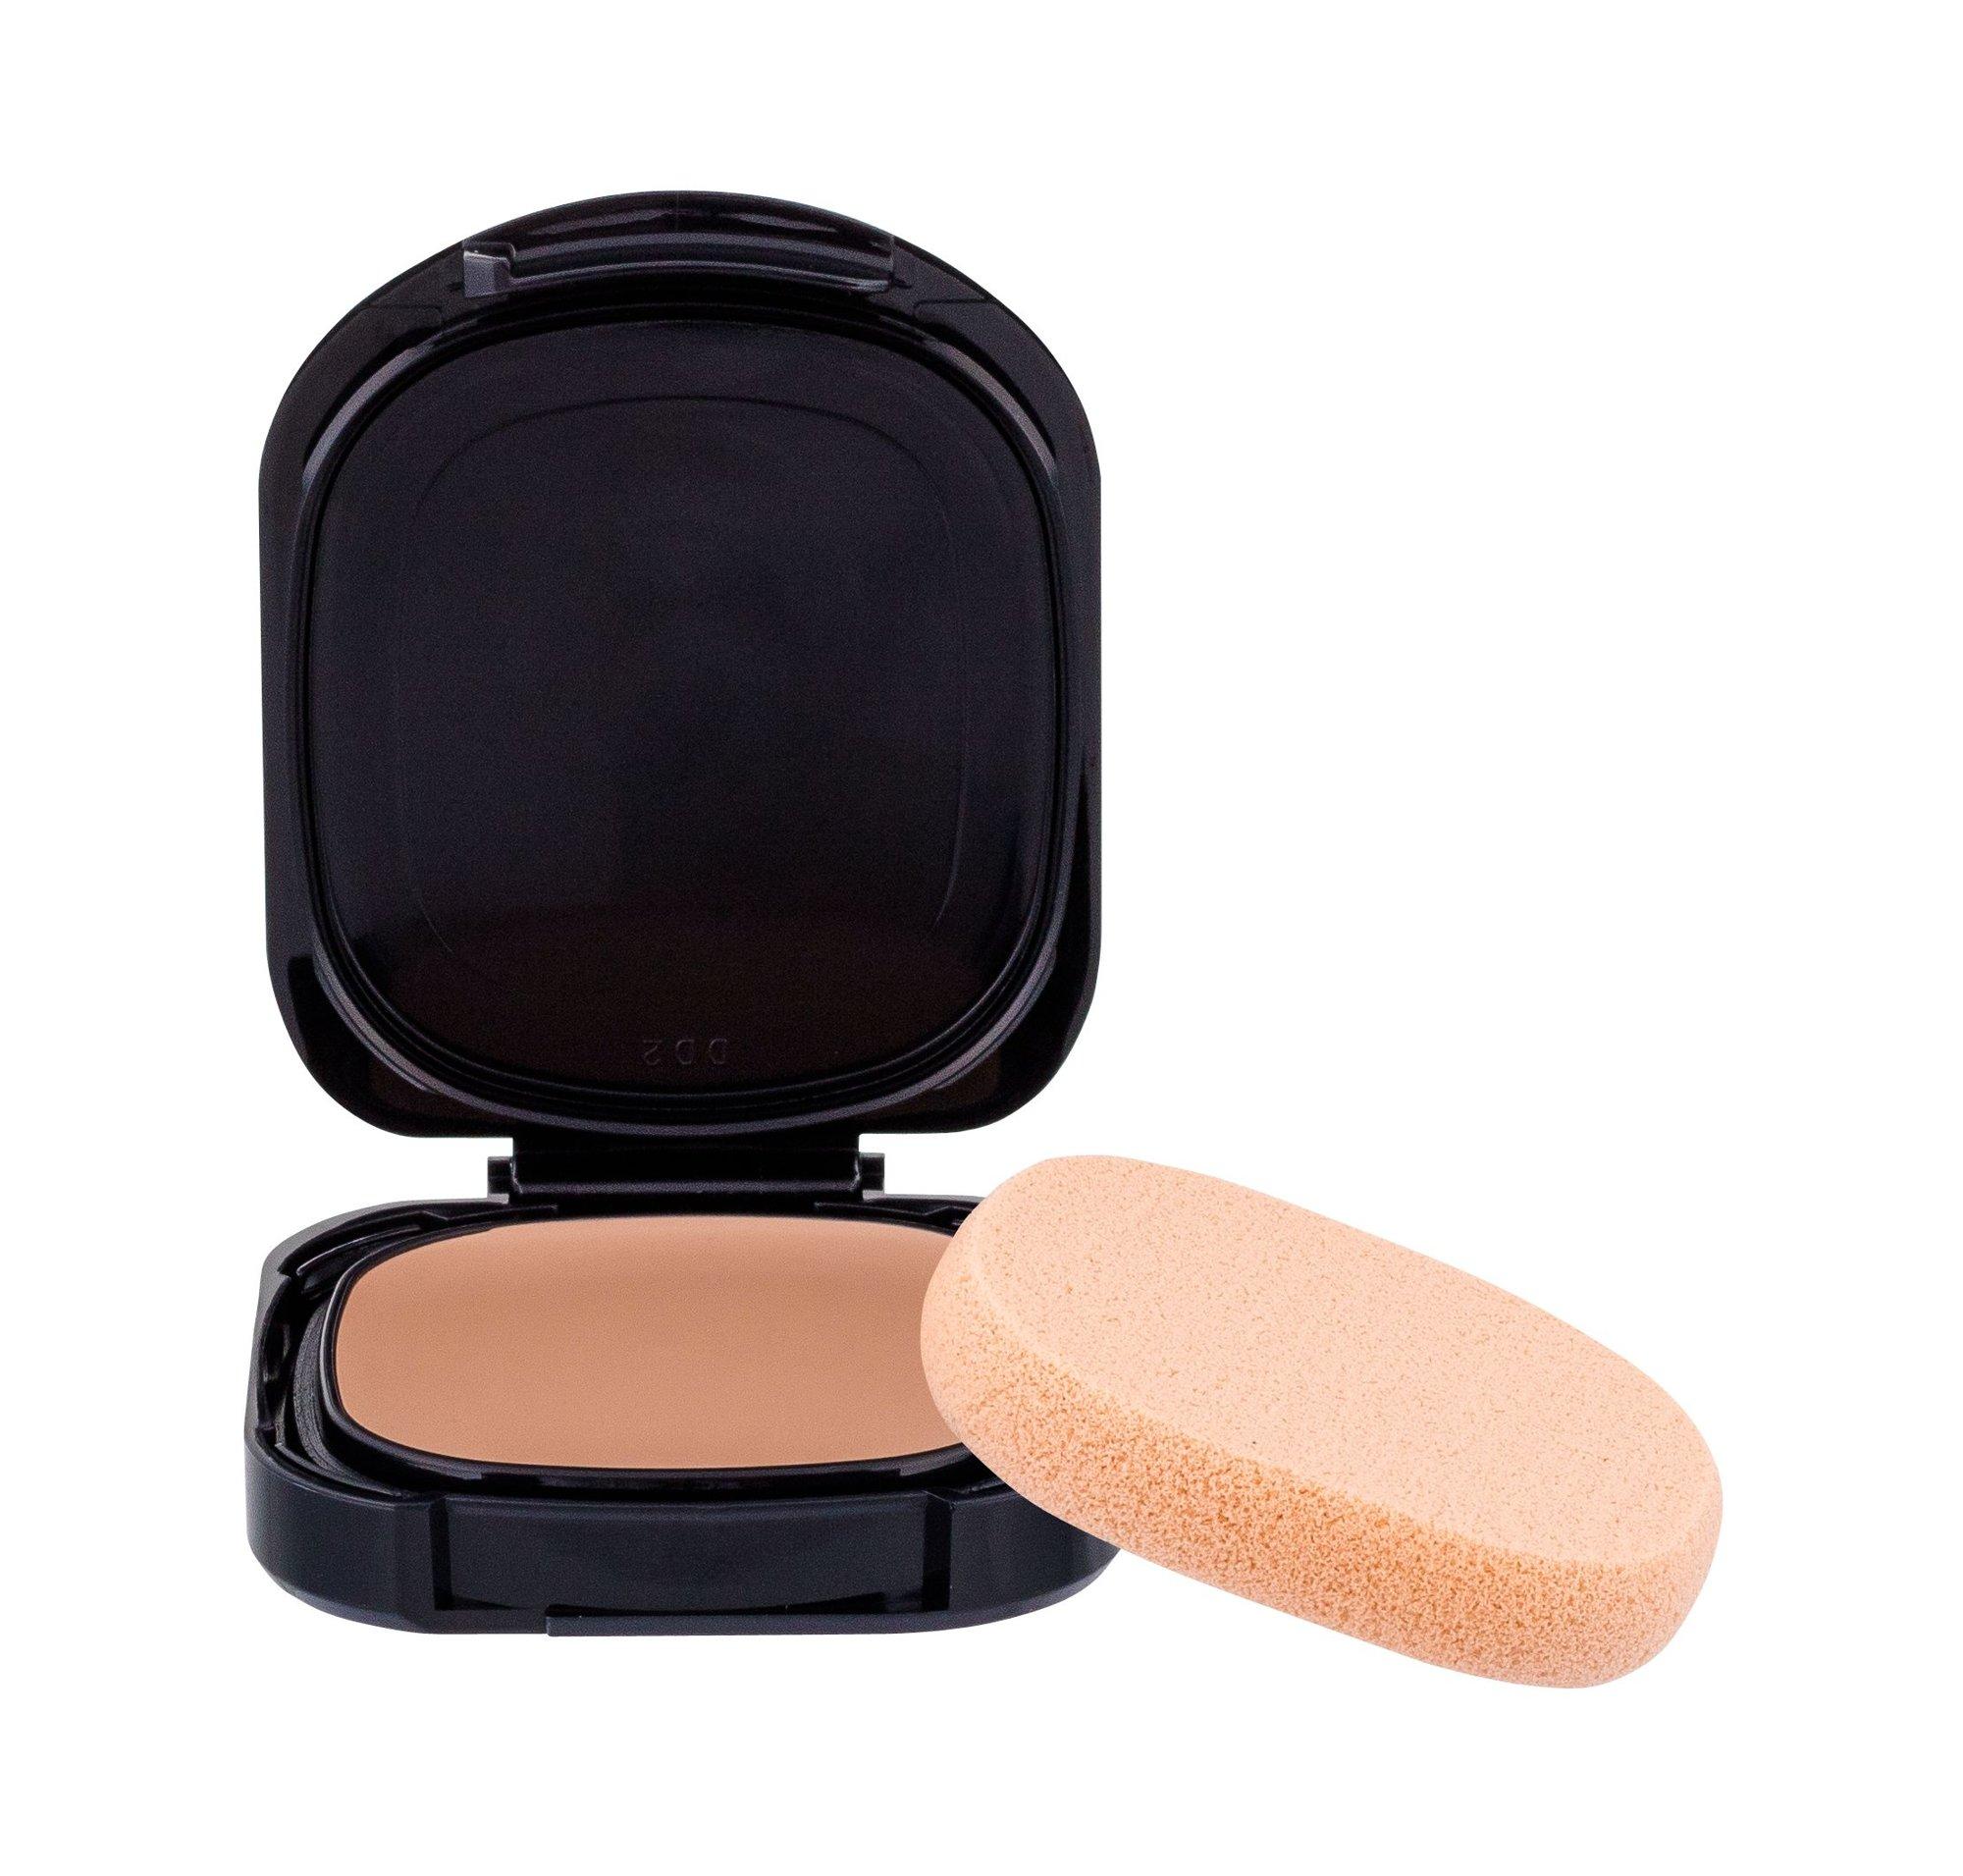 Shiseido Advanced Hydro-Liquid Makeup 12ml I60 Natural Deep Ivory